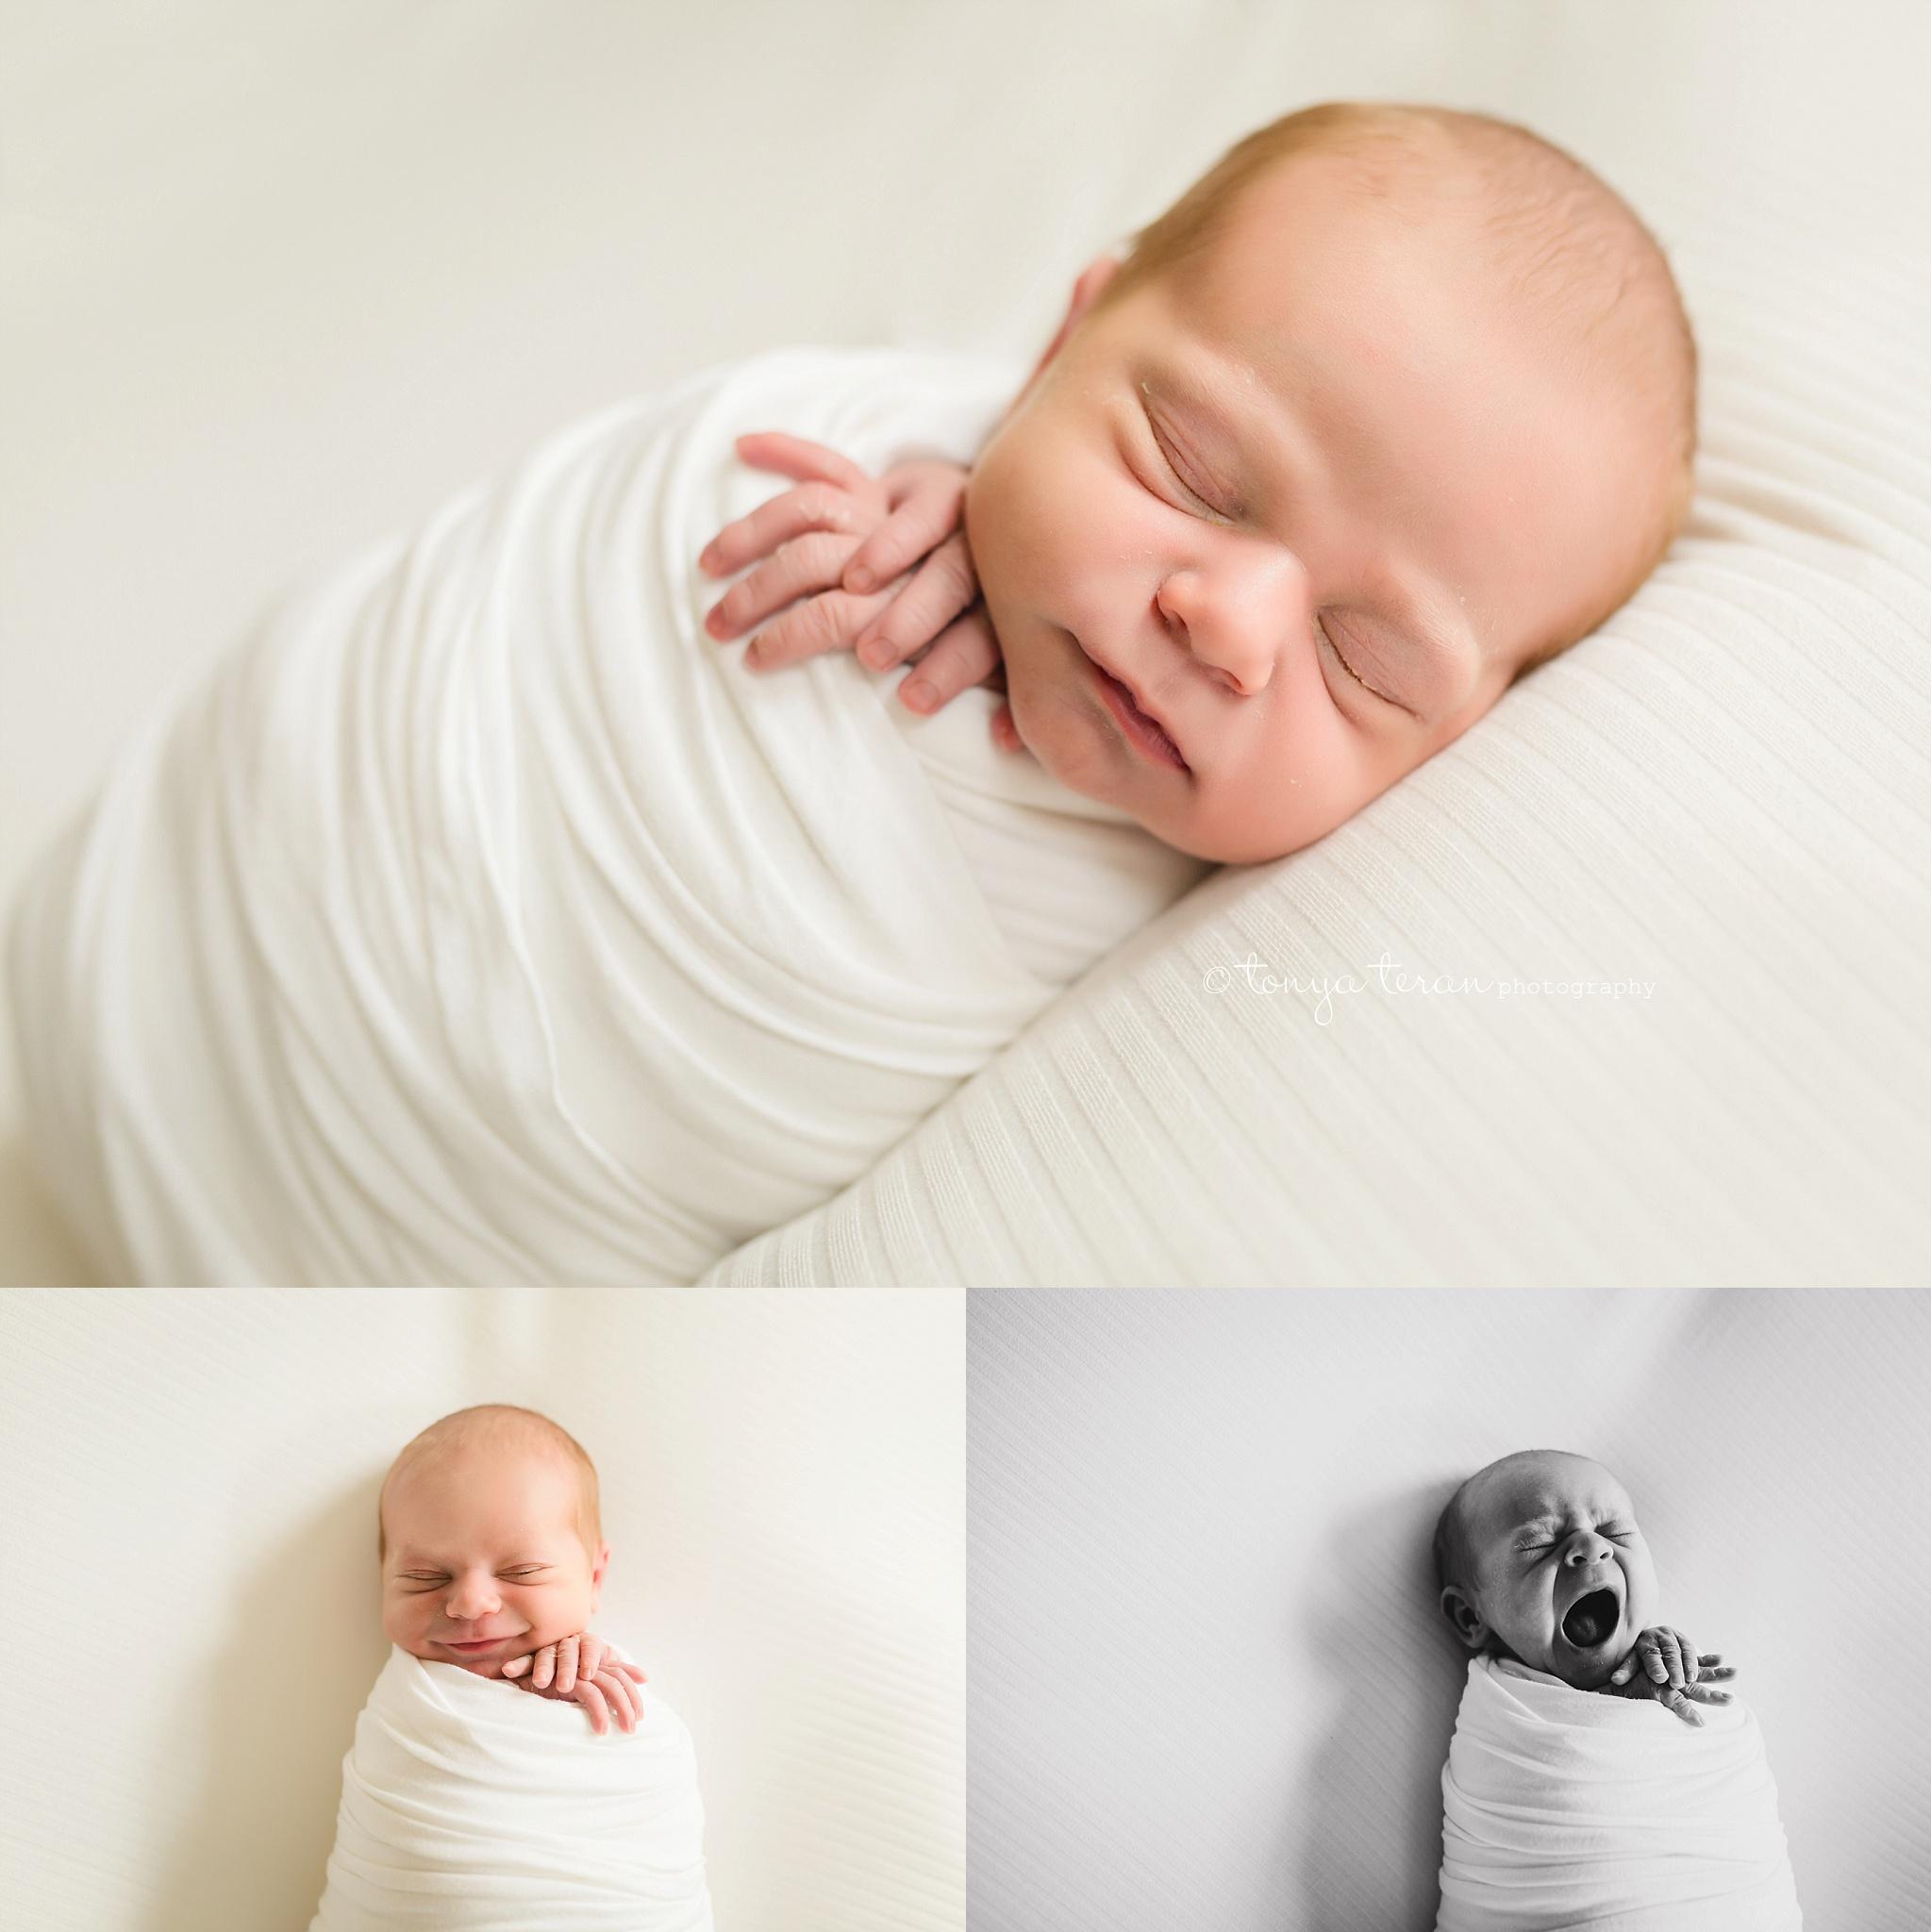 Newborn Studio Family Photo Session   Tonya Teran Photography, Bethesda, MD Newborn, Baby, and Family Photographer